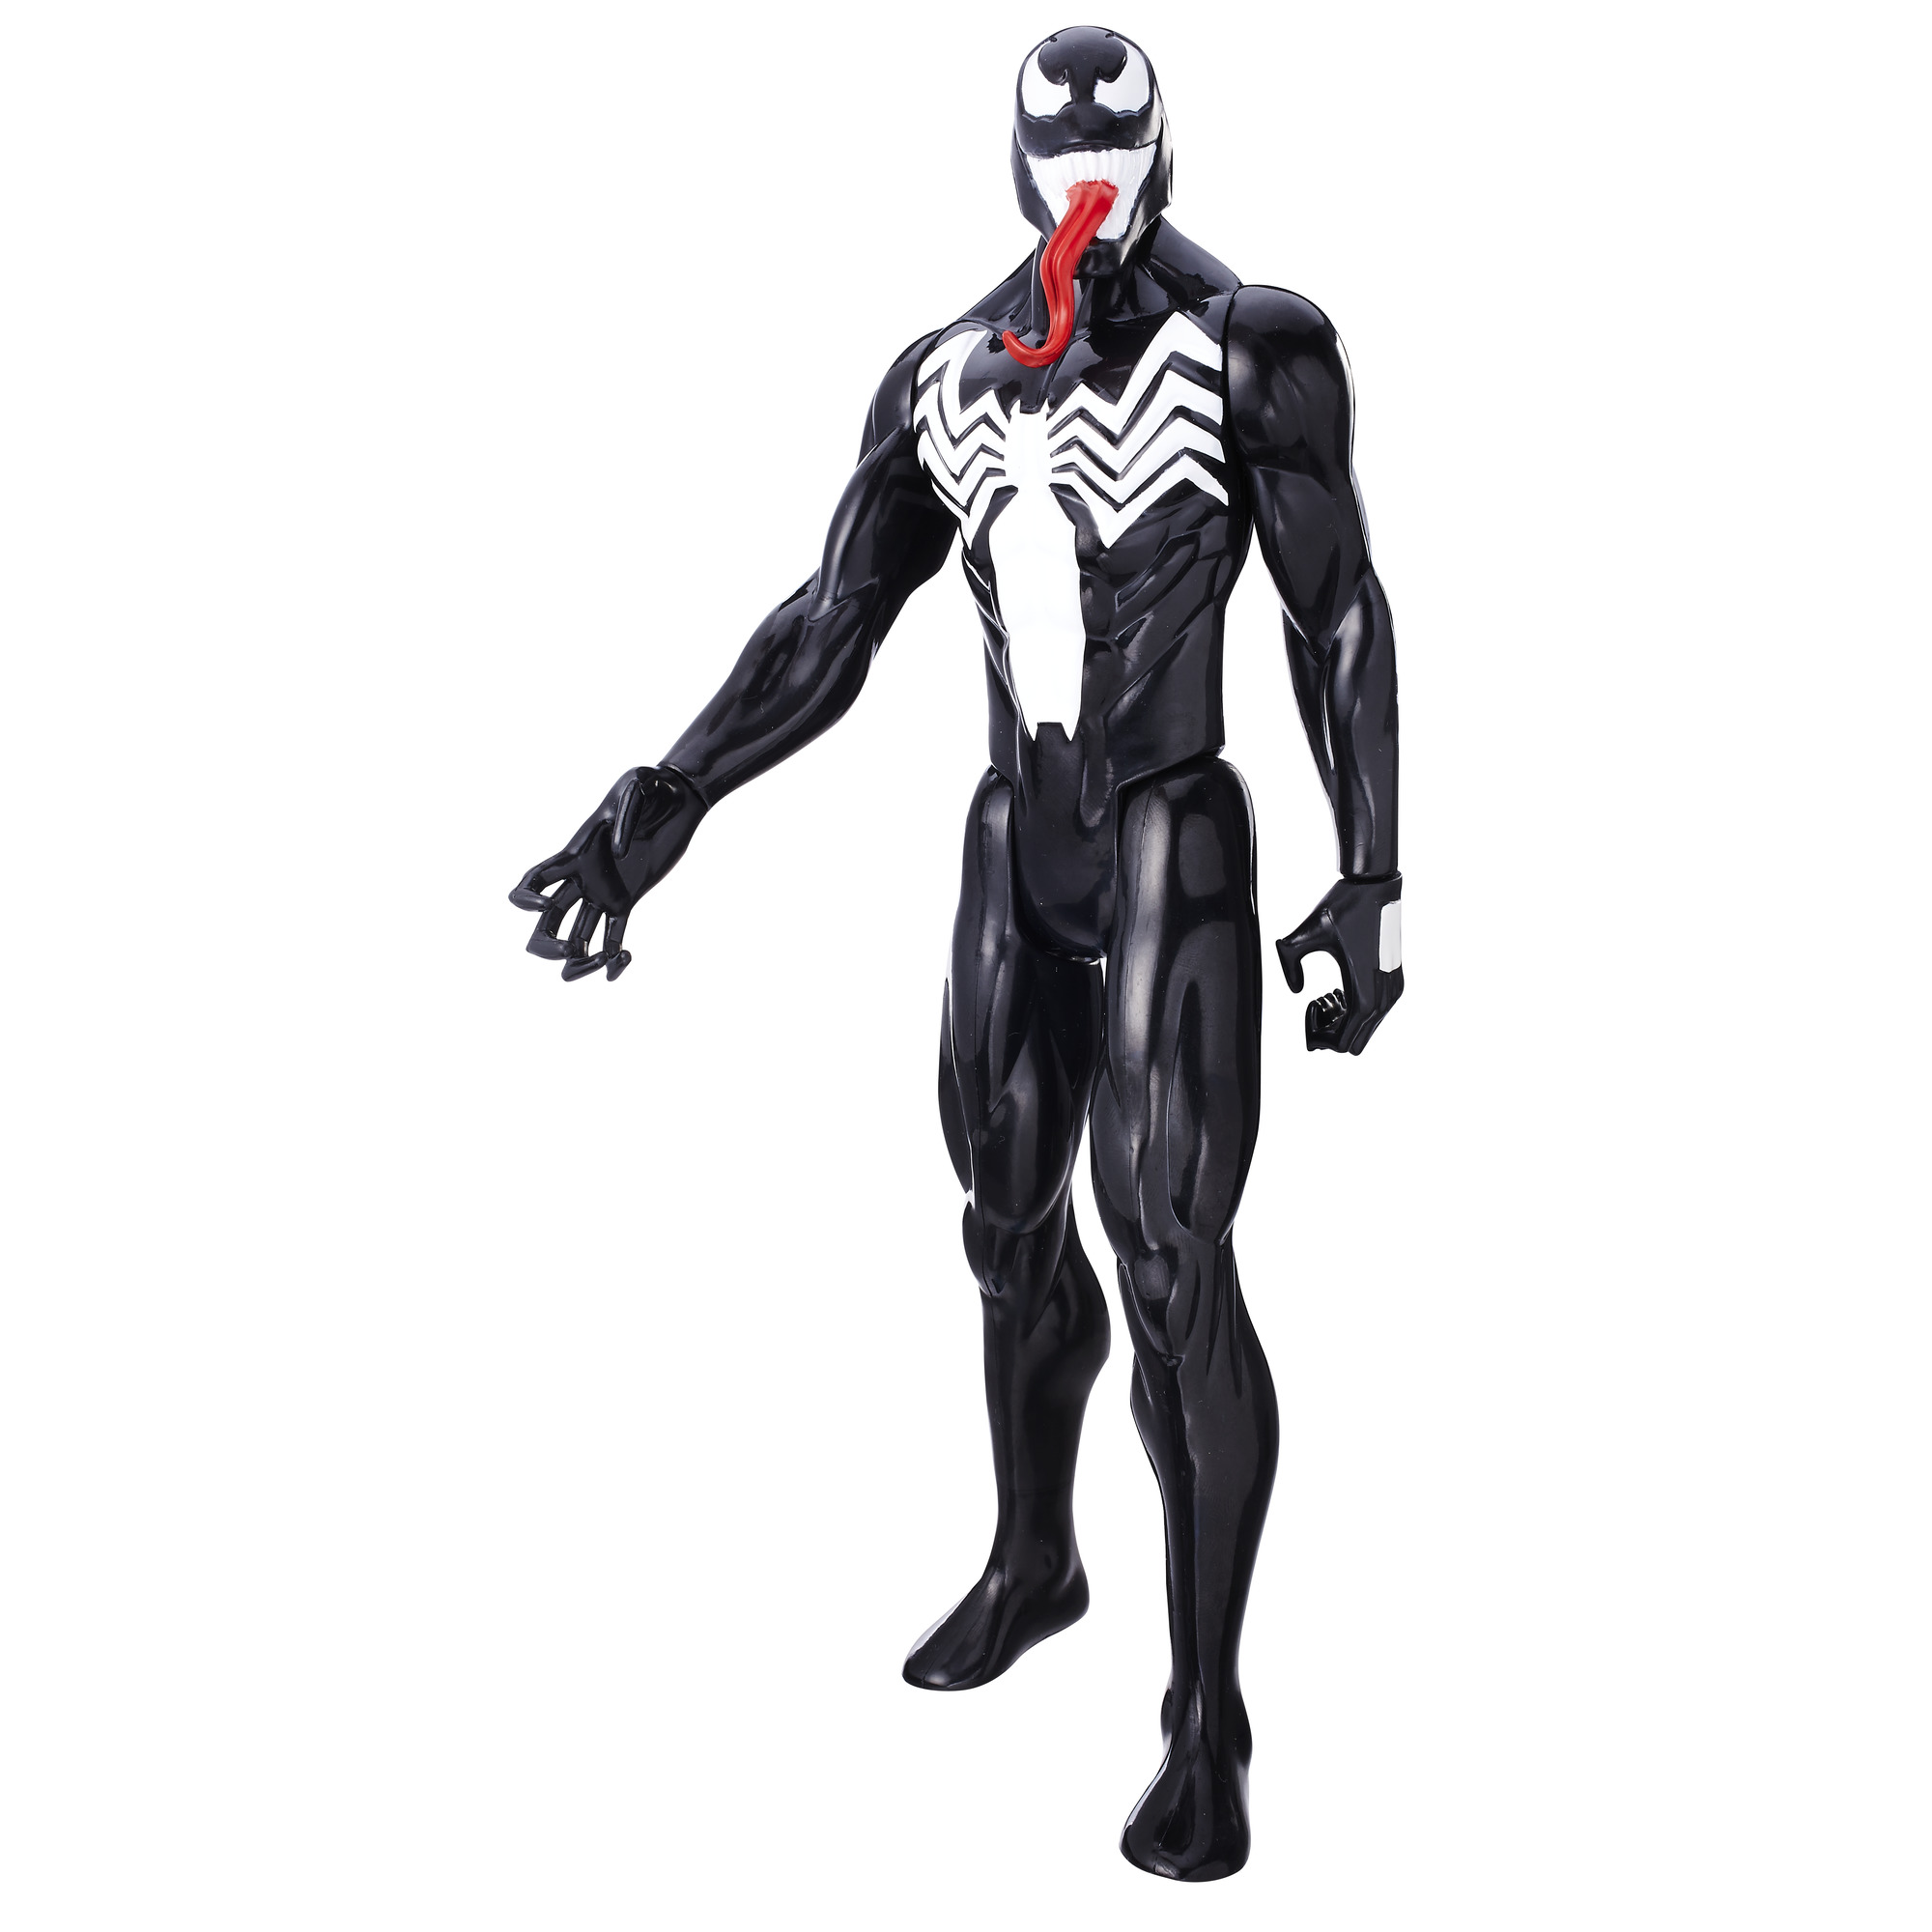 Spider-Man Titan Hero Series 12-inch Venom Figure by Hasbro